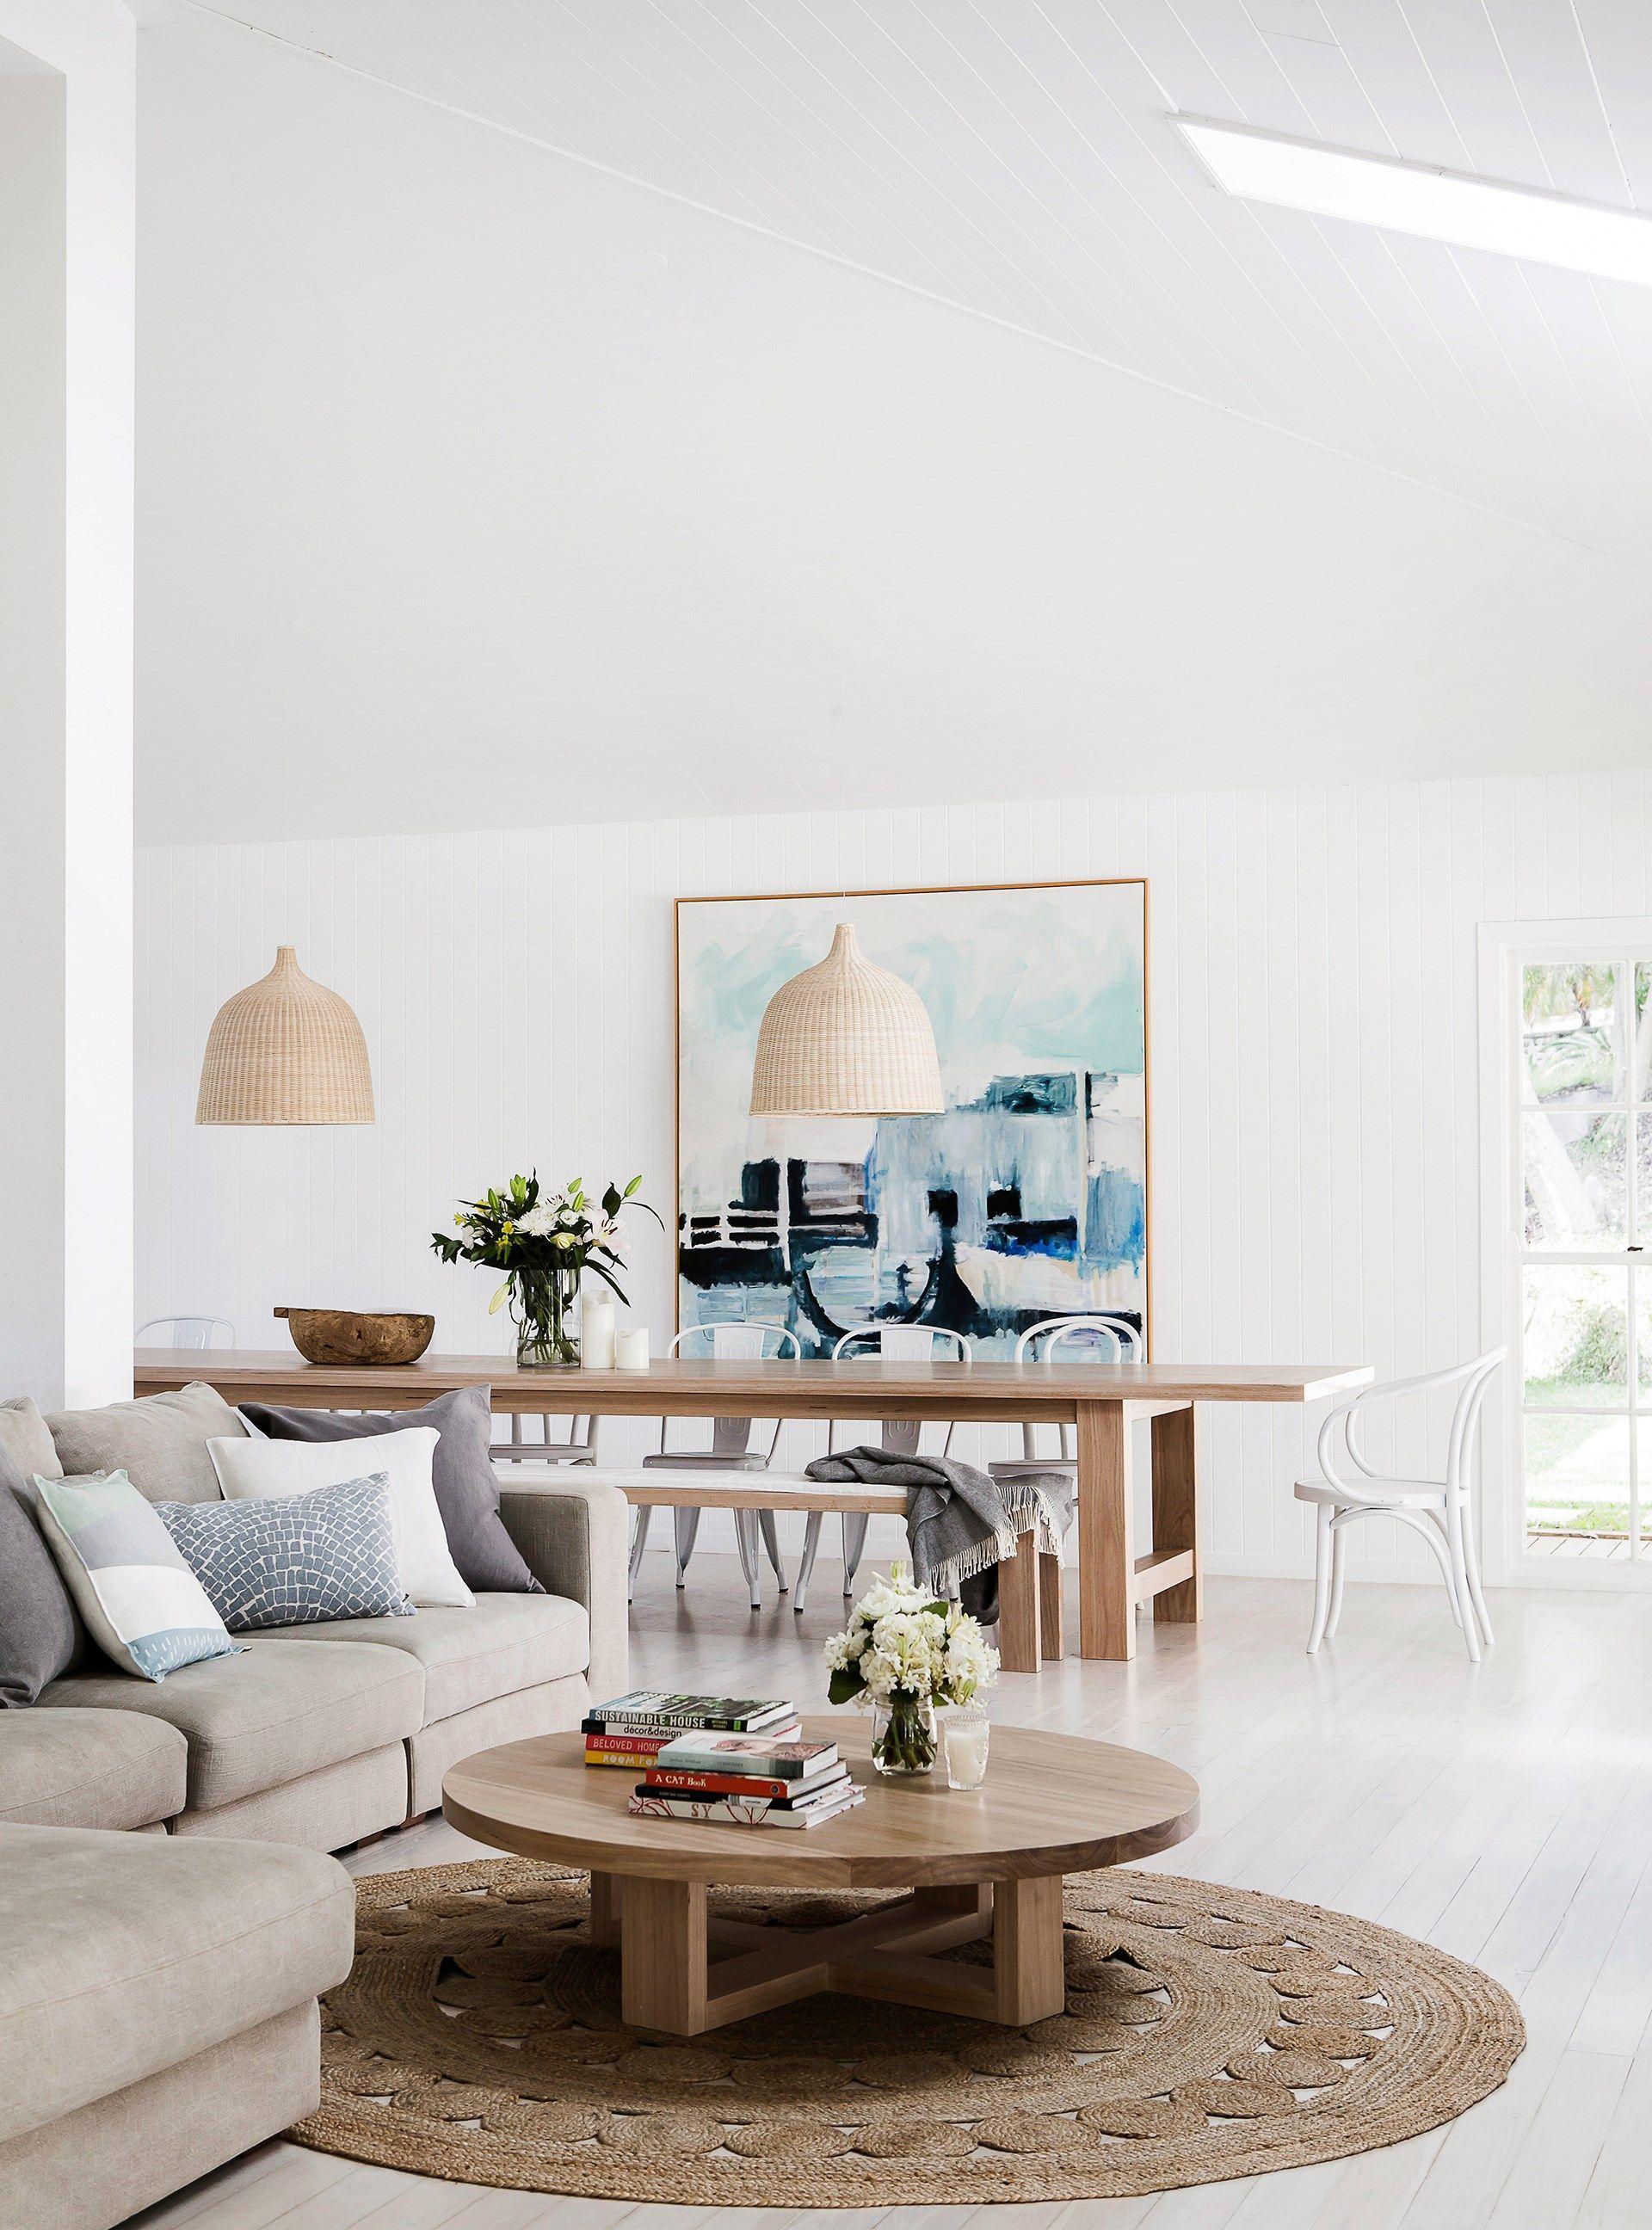 A Neutral Canvas In This Modern Beachside Home Http Www Homestolove Com Au Minimalist Coast Coastal Living Rooms Coastal Living Room Minimalist Living Room Living room decor australia